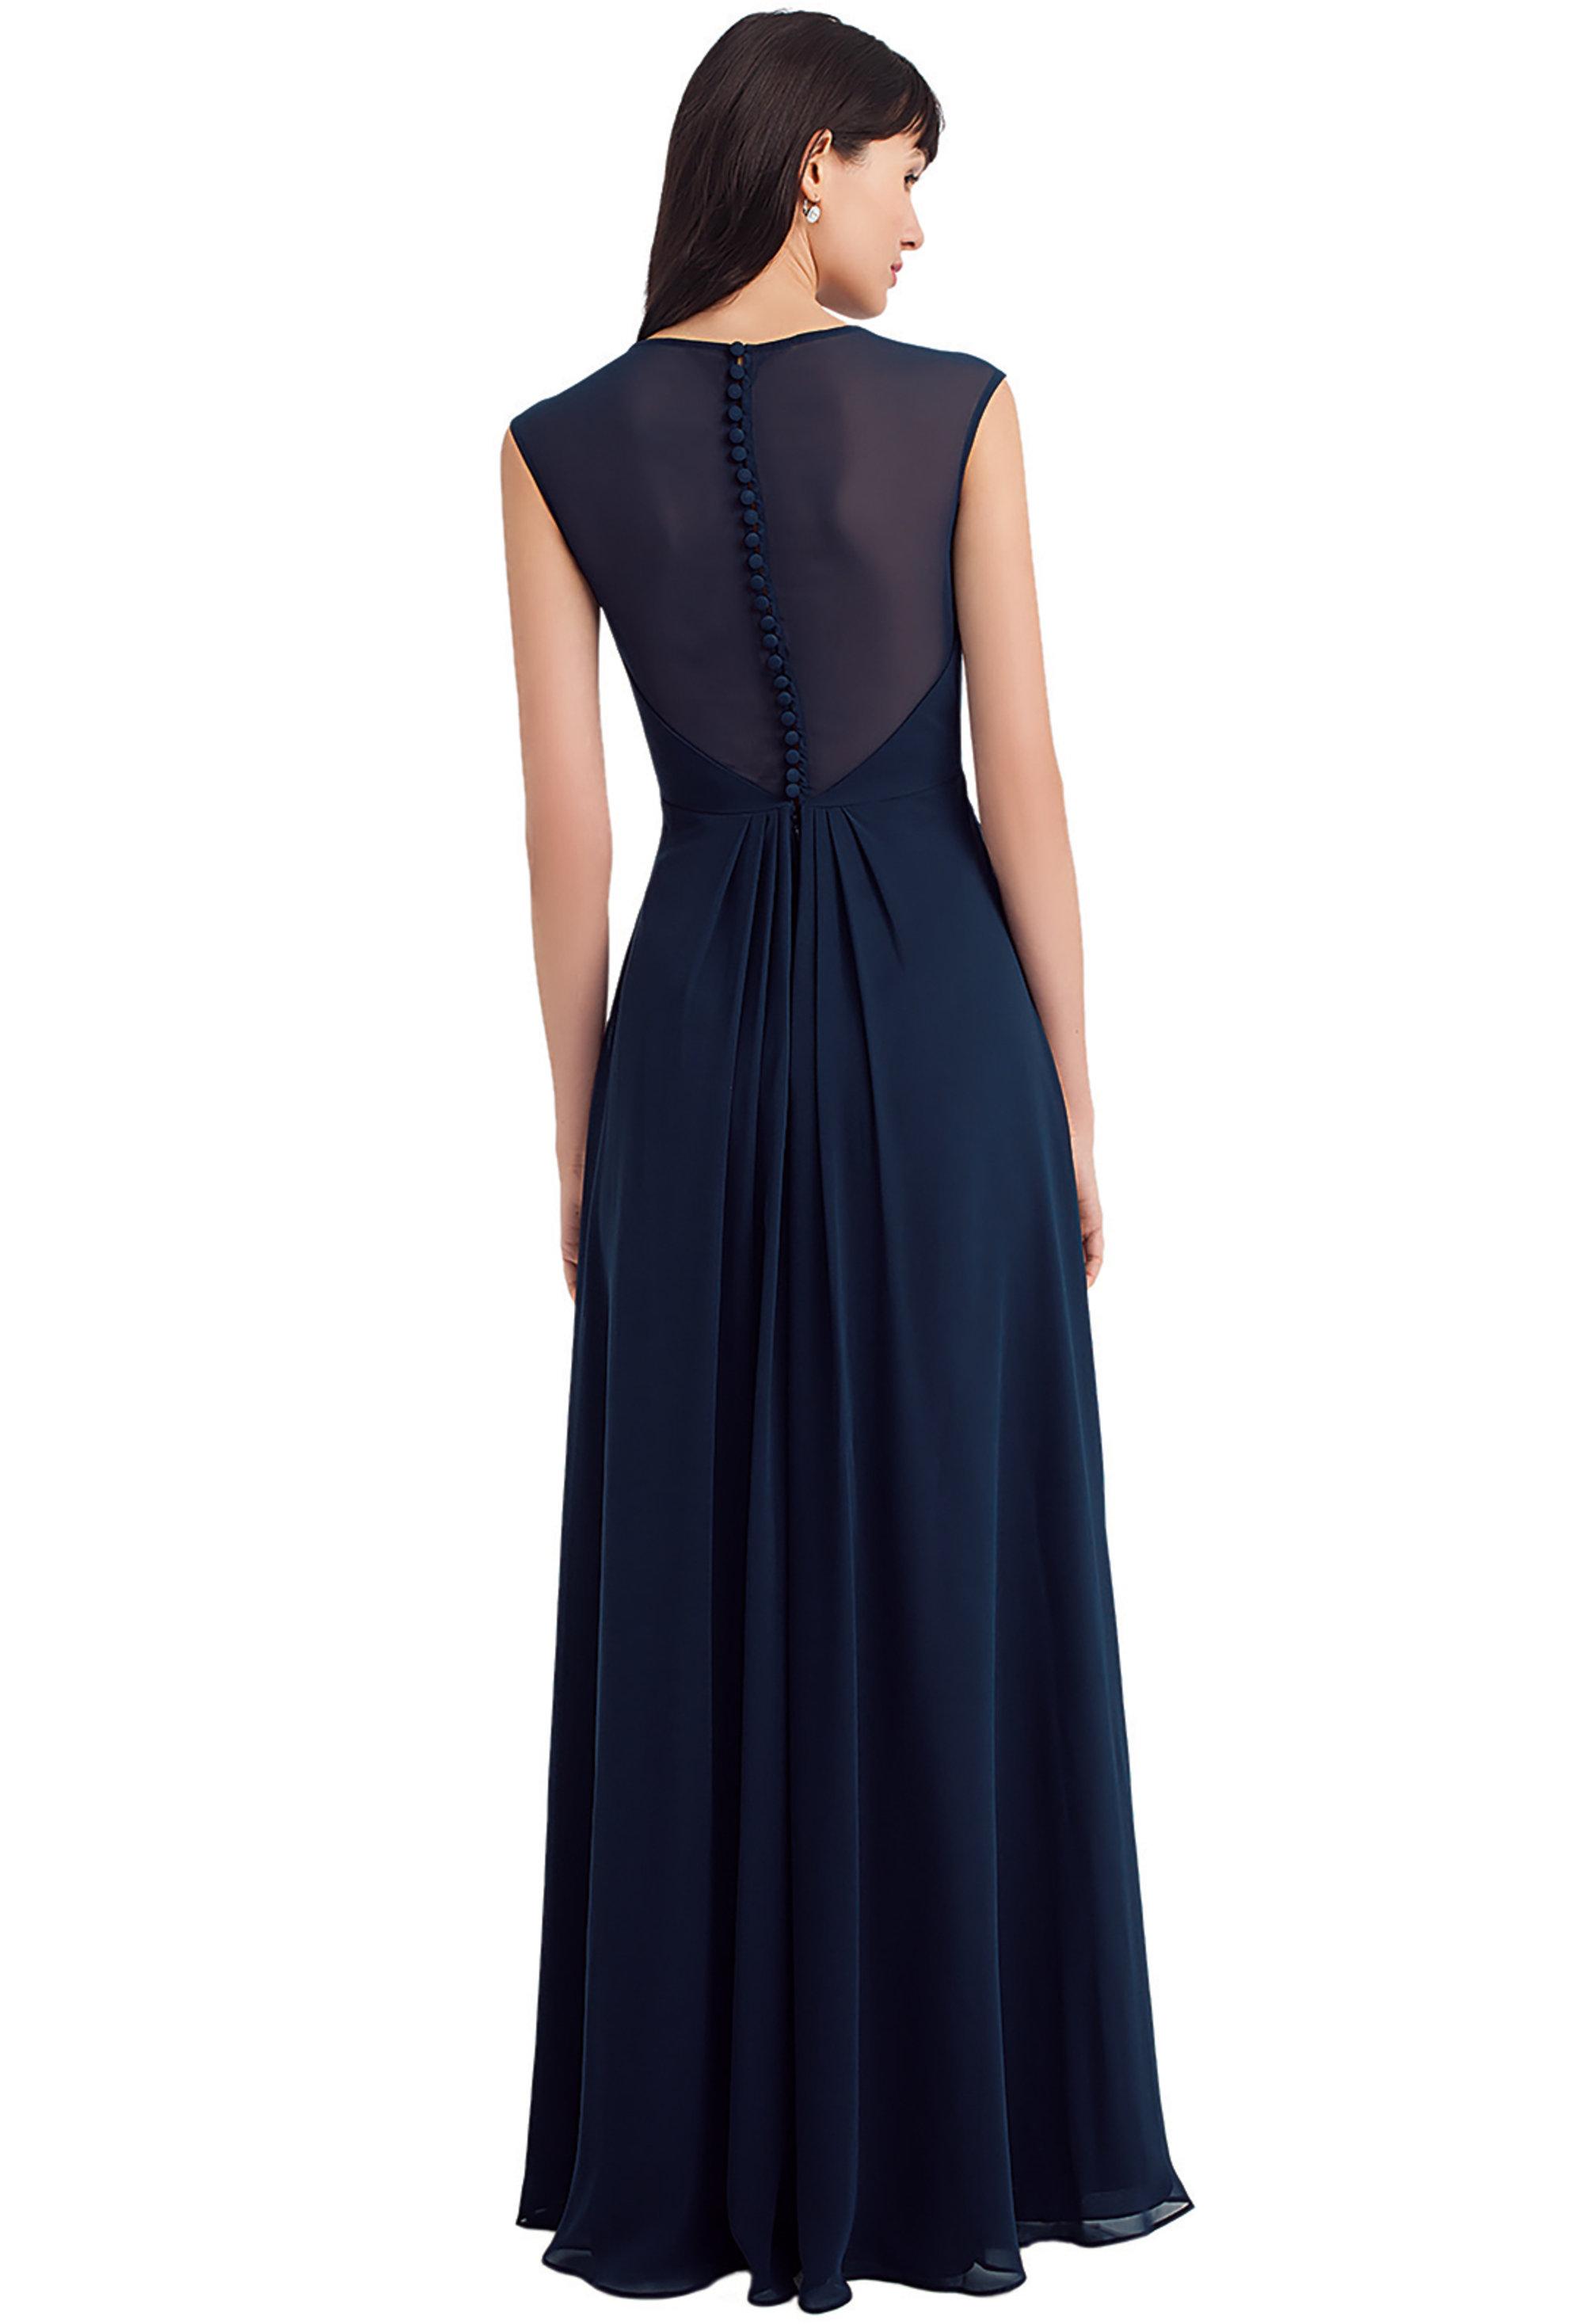 Bill Levkoff HORIZON Chiffon Sweetheart A-line gown, $220.00 Back